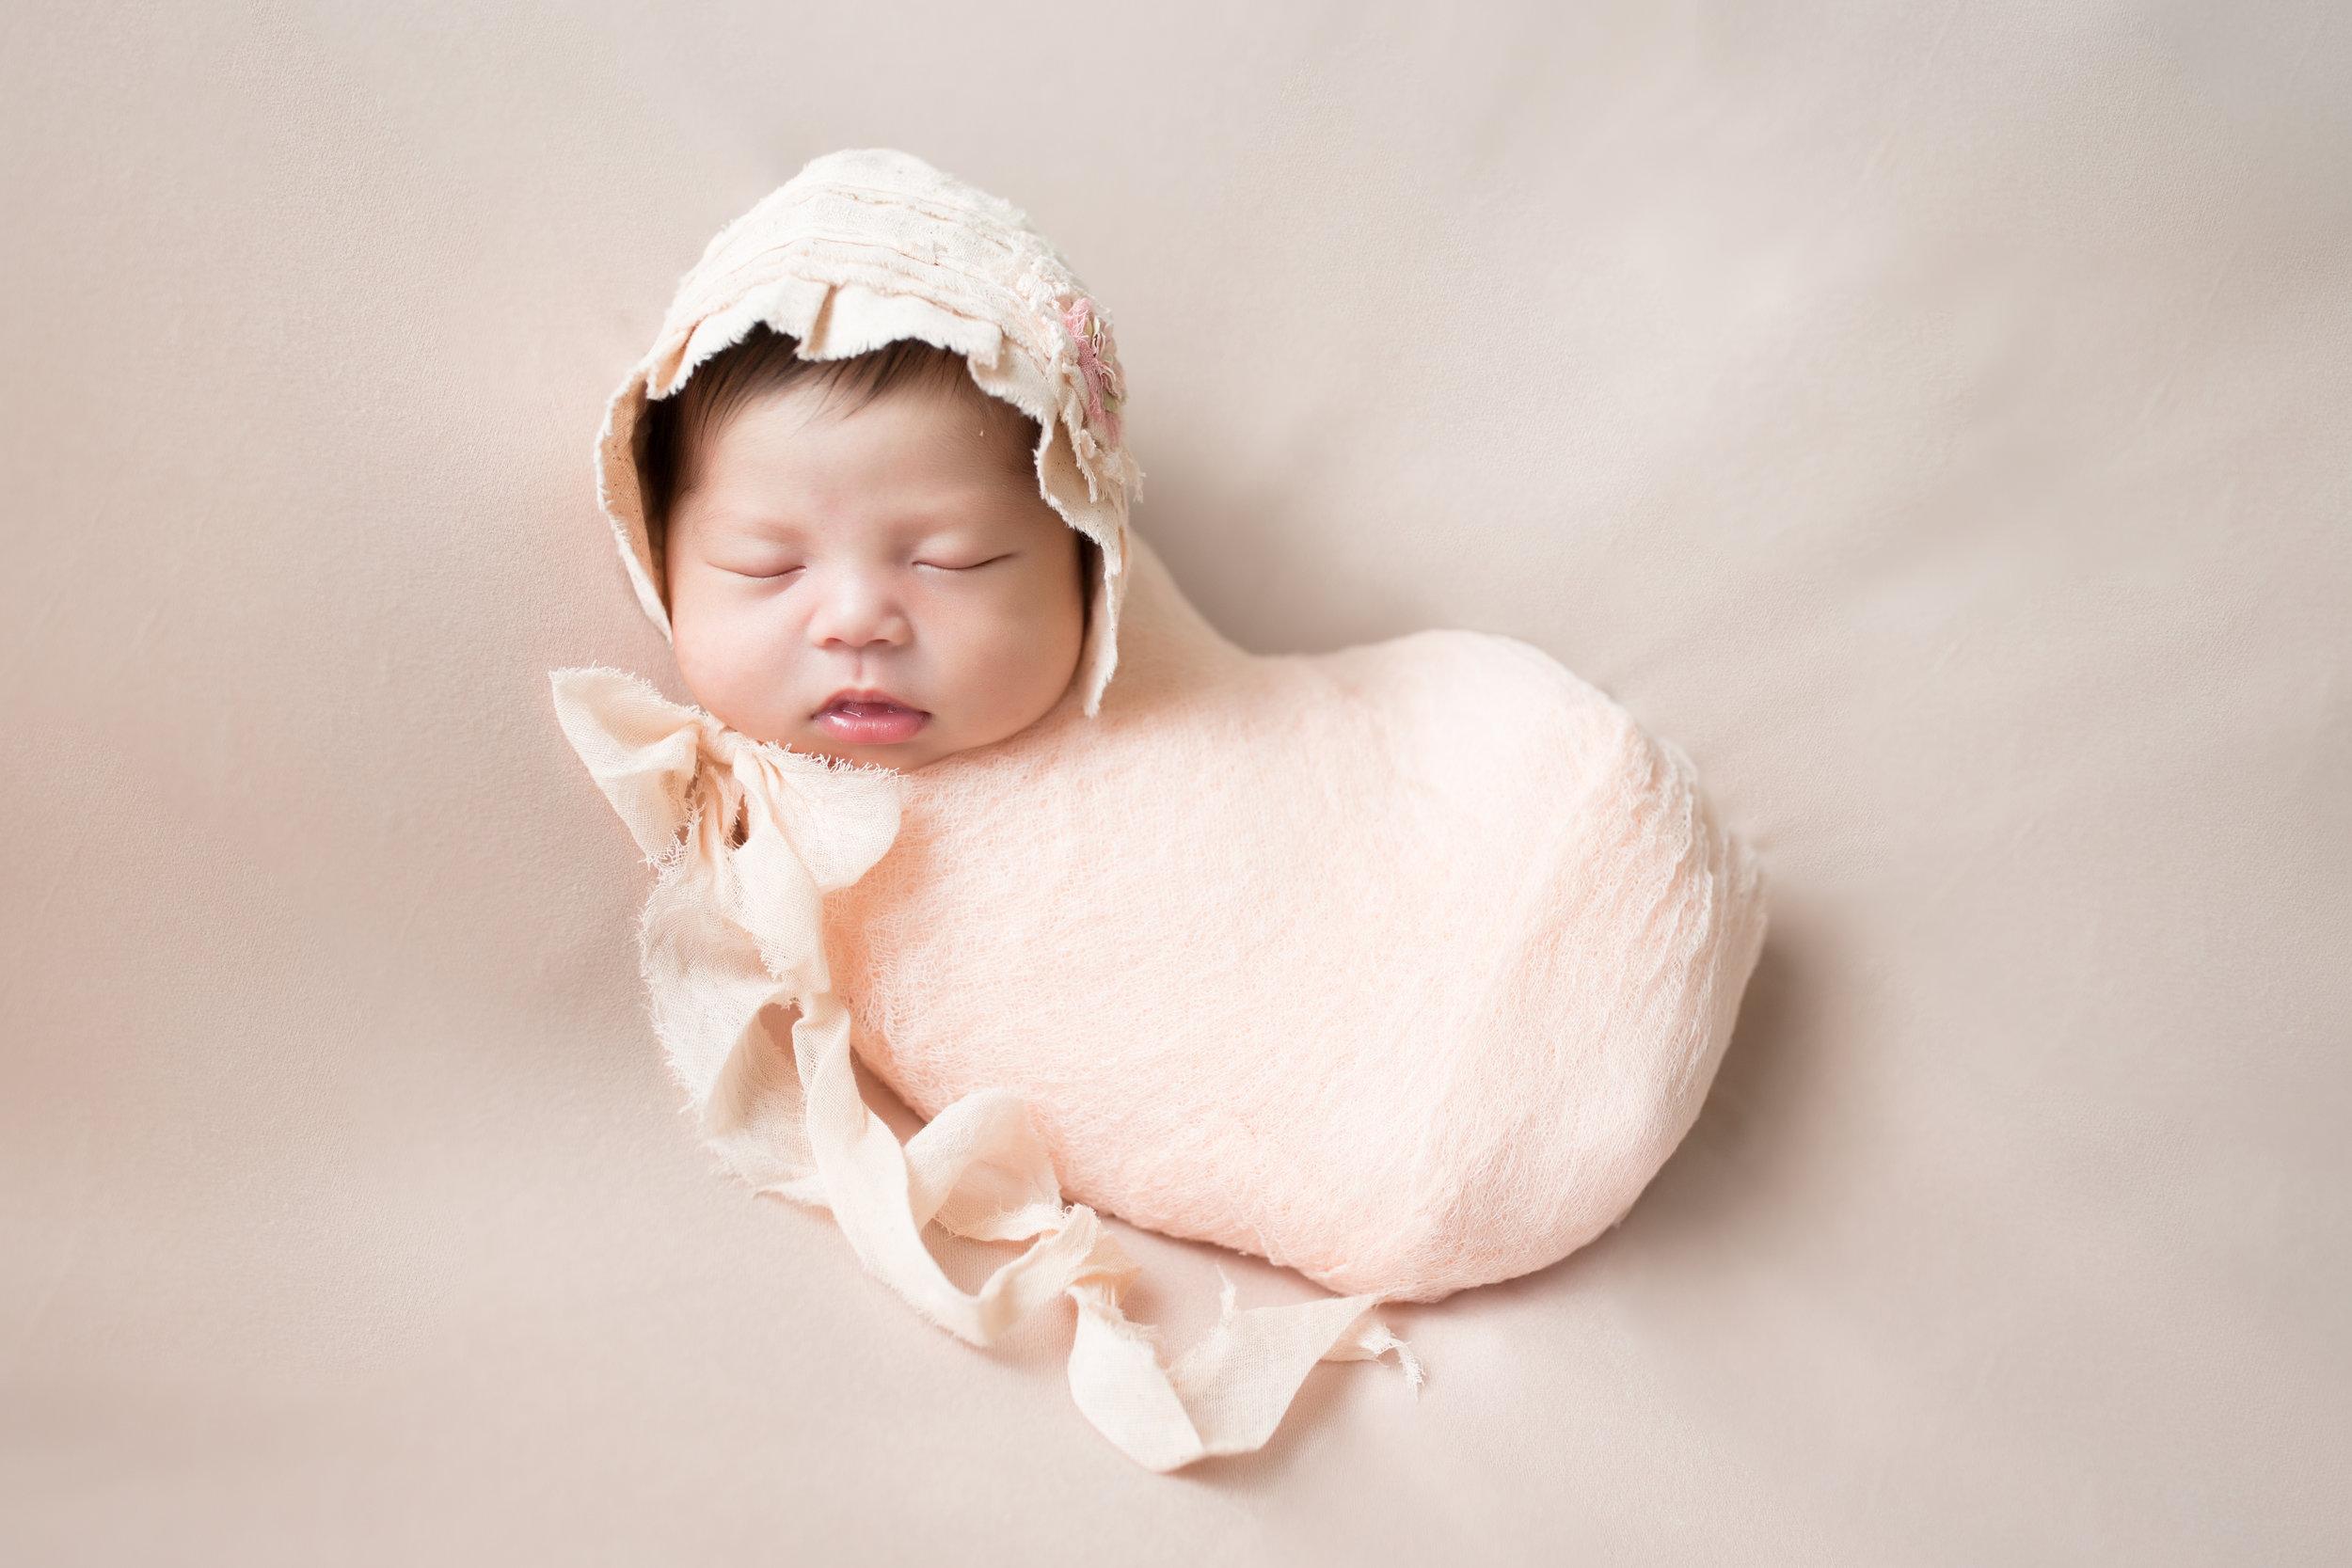 dba45ae5cd417 Baby Malia   Newborn Session   Campbell Kamine Photography--3.jpg